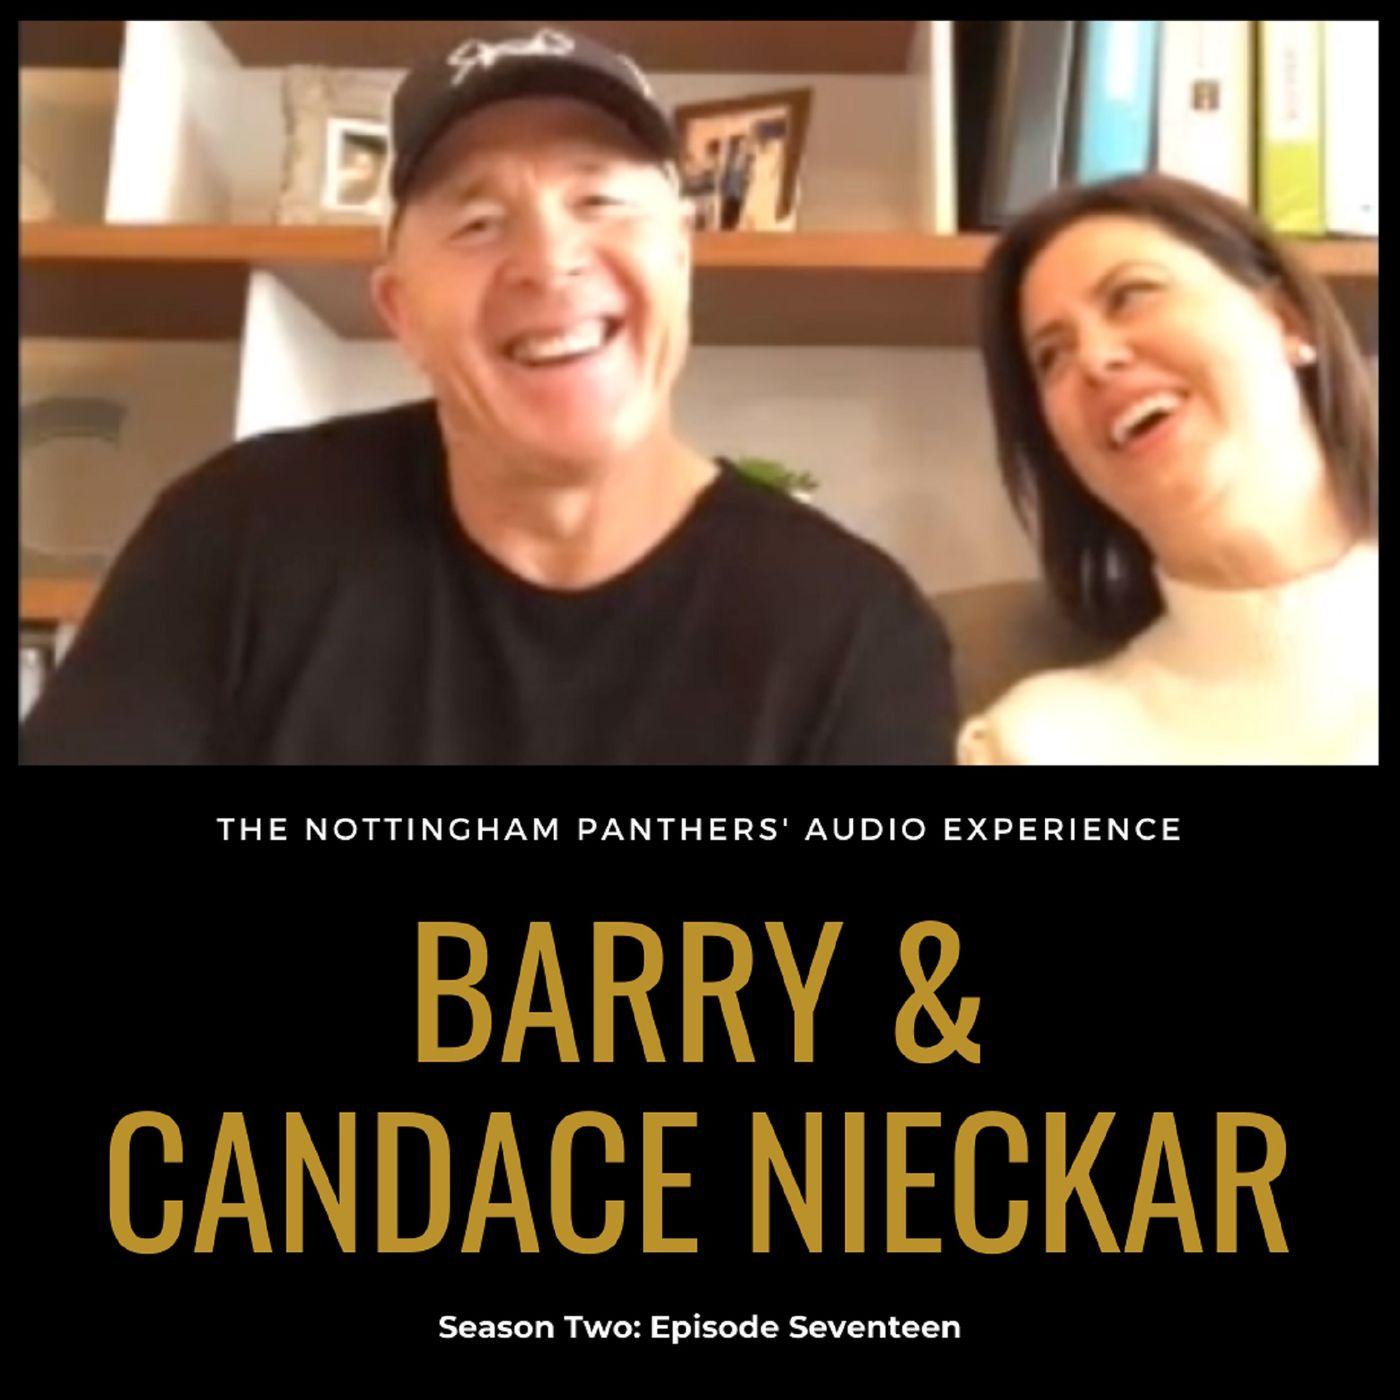 Barry & Candace Nieckar   Season Two: Episode Seventeen